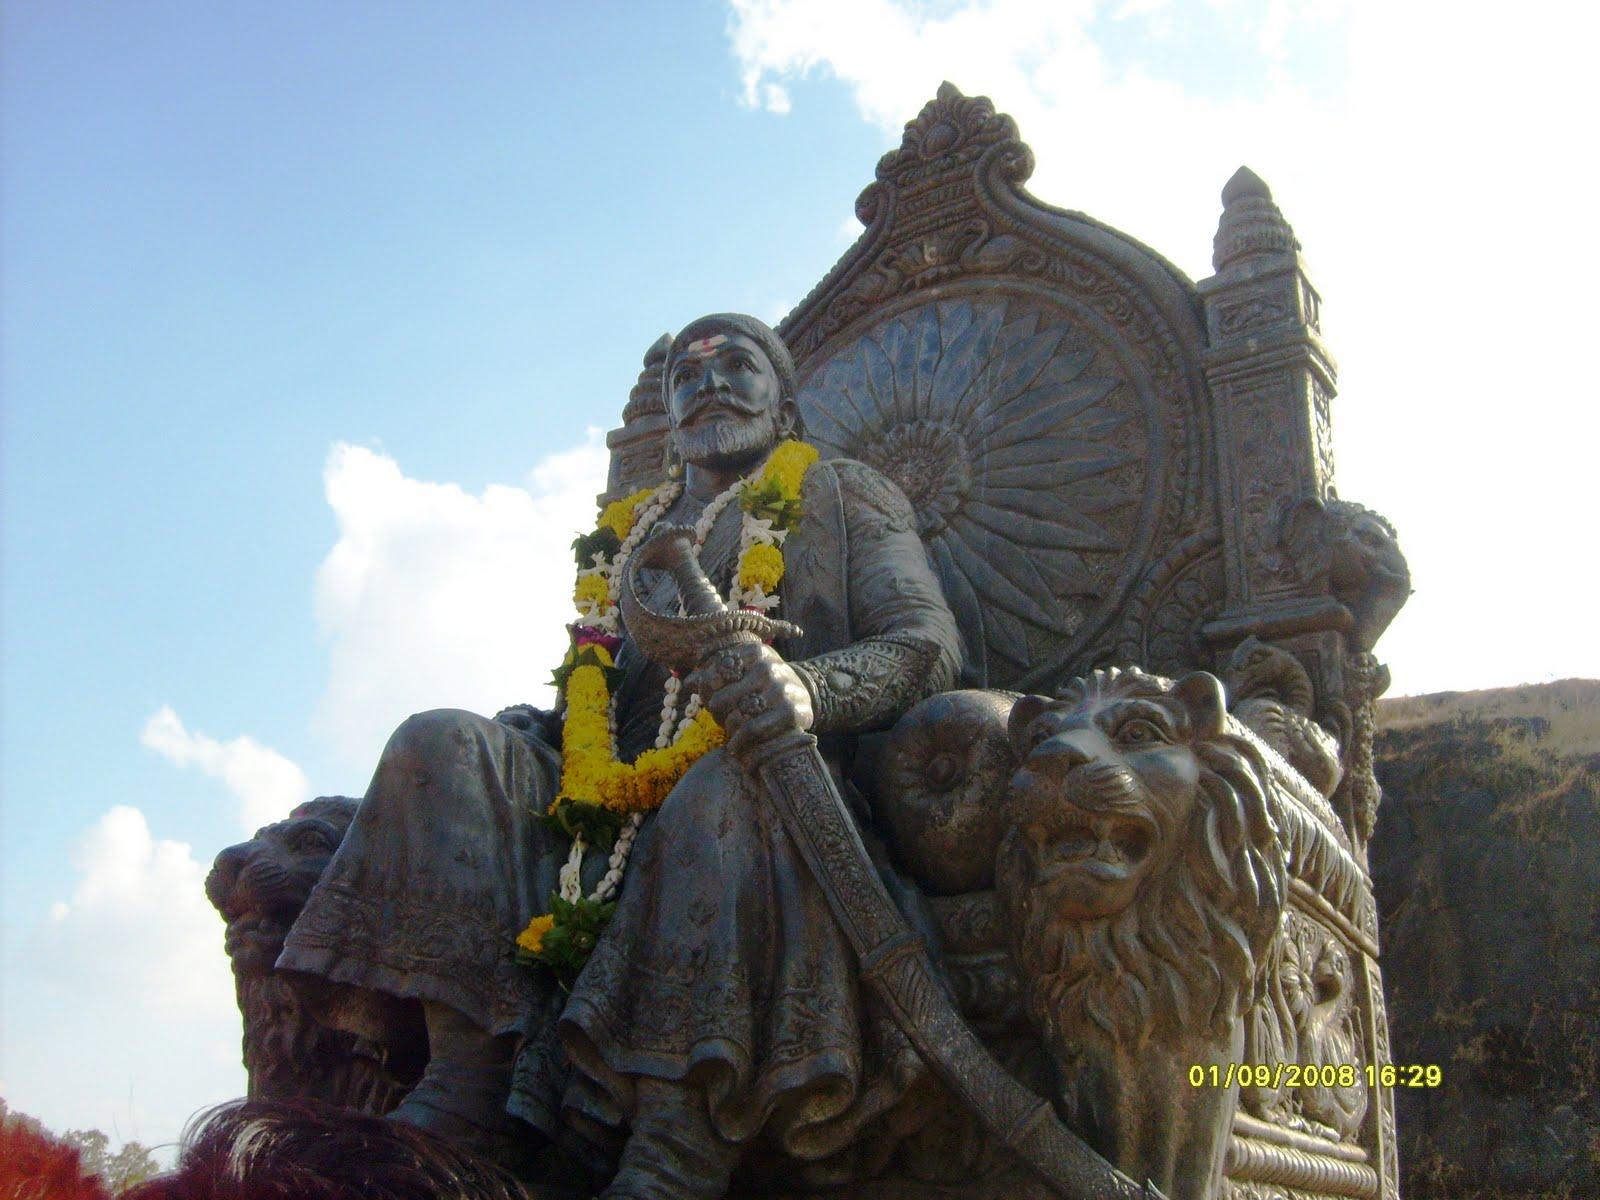 Chatrapati Shivaji Maharaj Hd Pic: Abhijeet Wallpaper